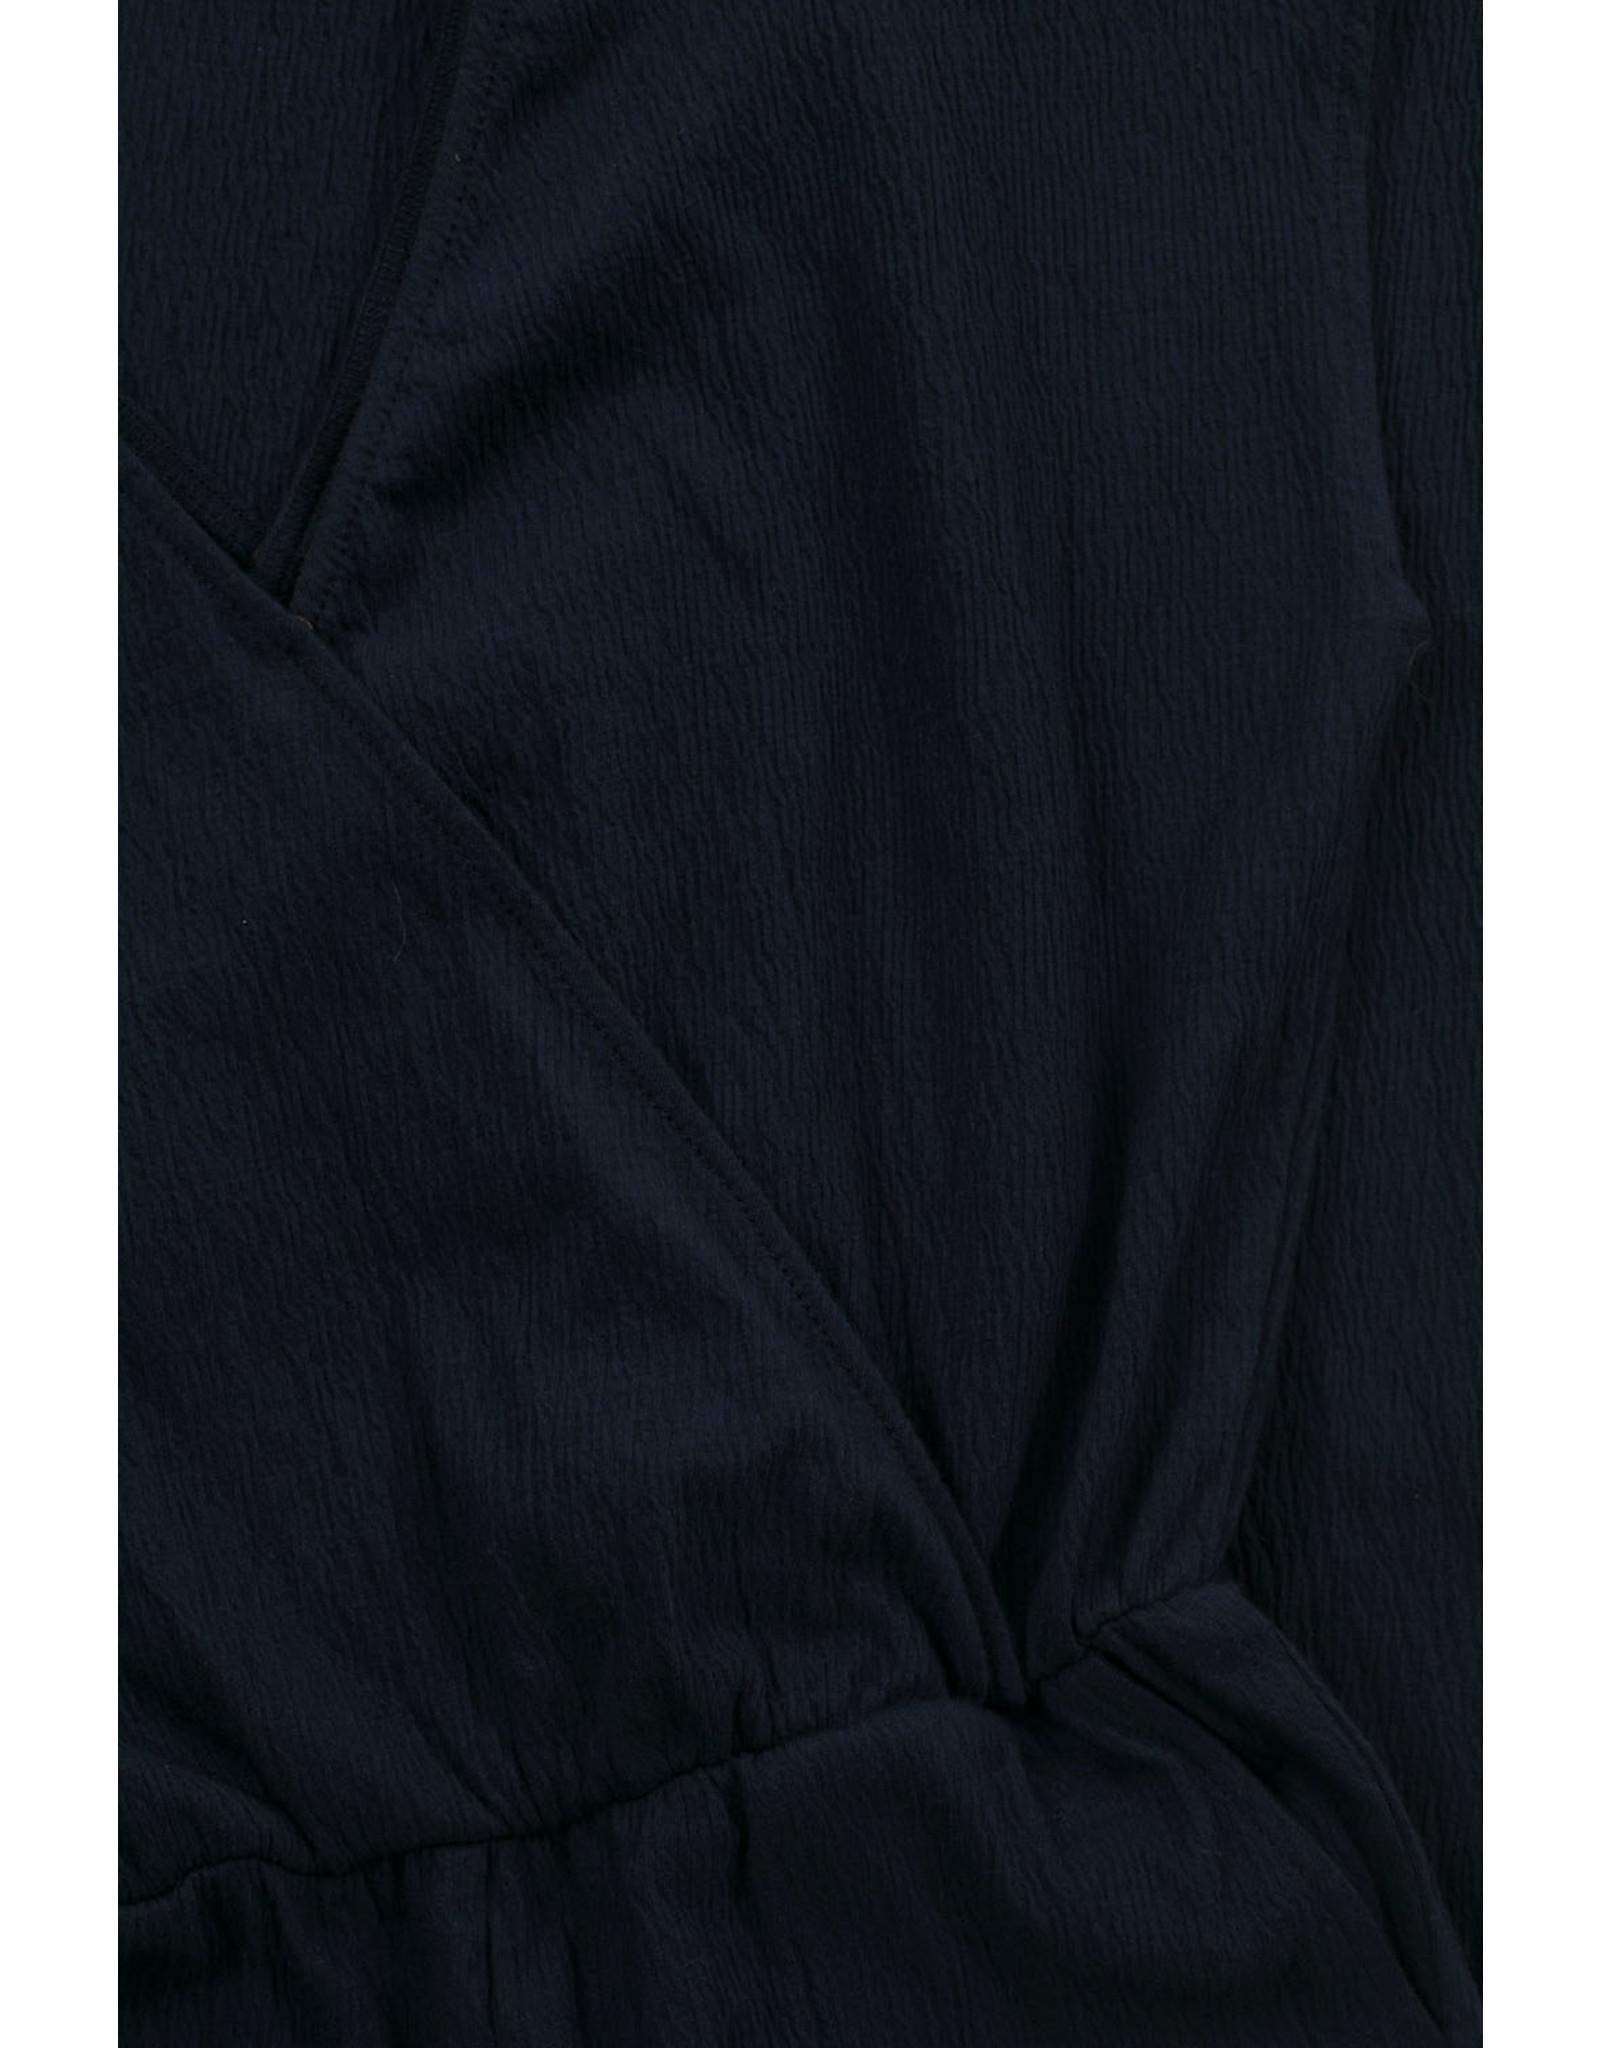 Looxs 10Sixteen Jumpsuit OXFORD BLUE